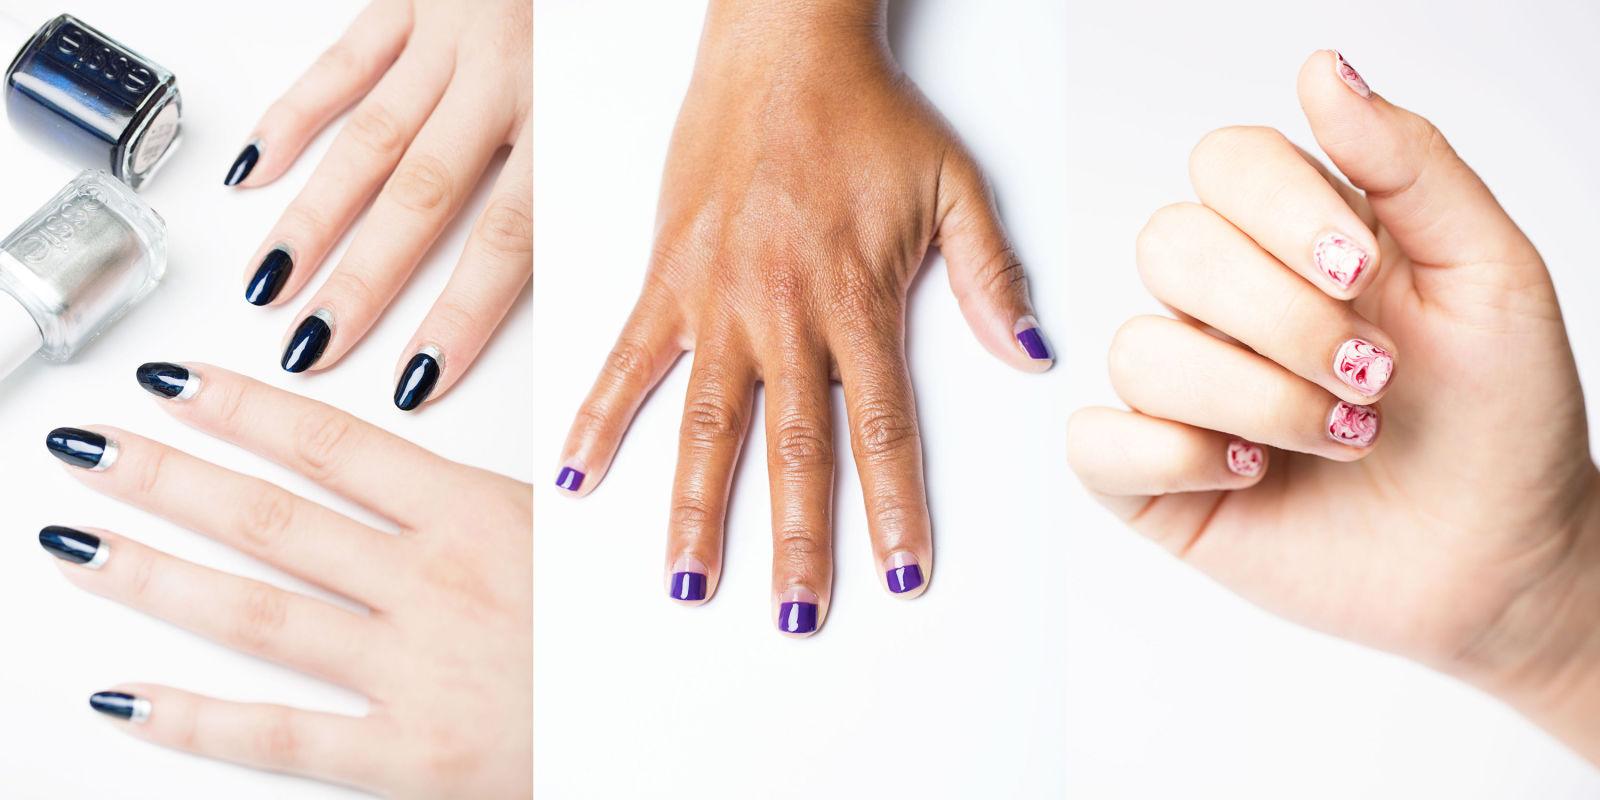 12 Easy Nail Designs